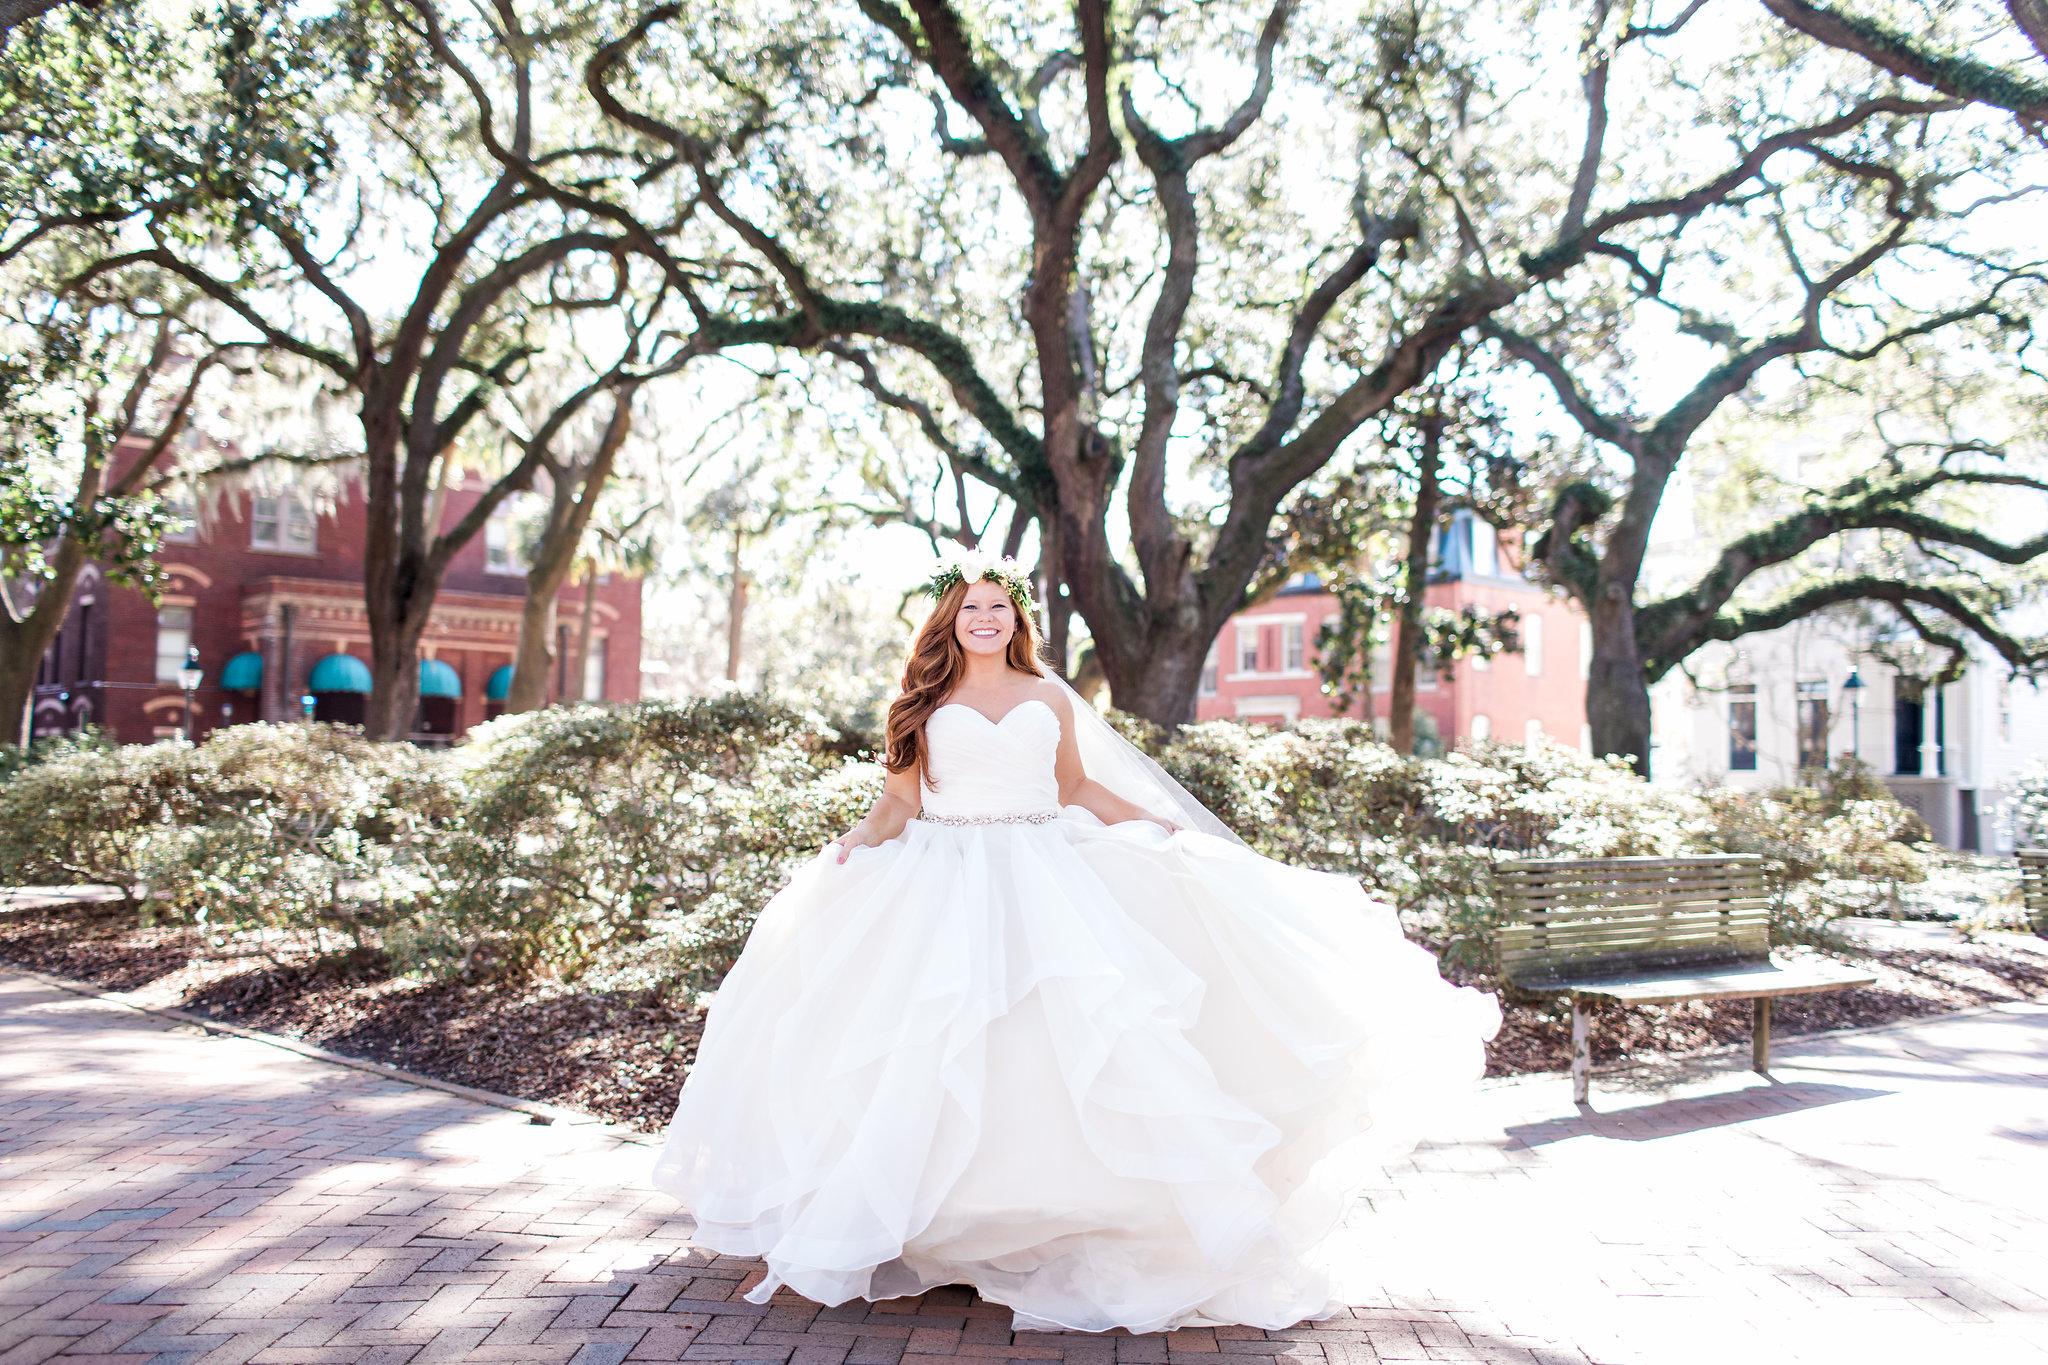 apt-b-photography-mary-elizabeths-bridal-boutique-adele-amelia-accessories-morilee-5504-savannah-bridal-boutique-savannah-weddings-savannah-wedding-photographer-savannah-bridal-gowns-savannah-wedding-dresses-historic-savannah-wedding-14.jpg